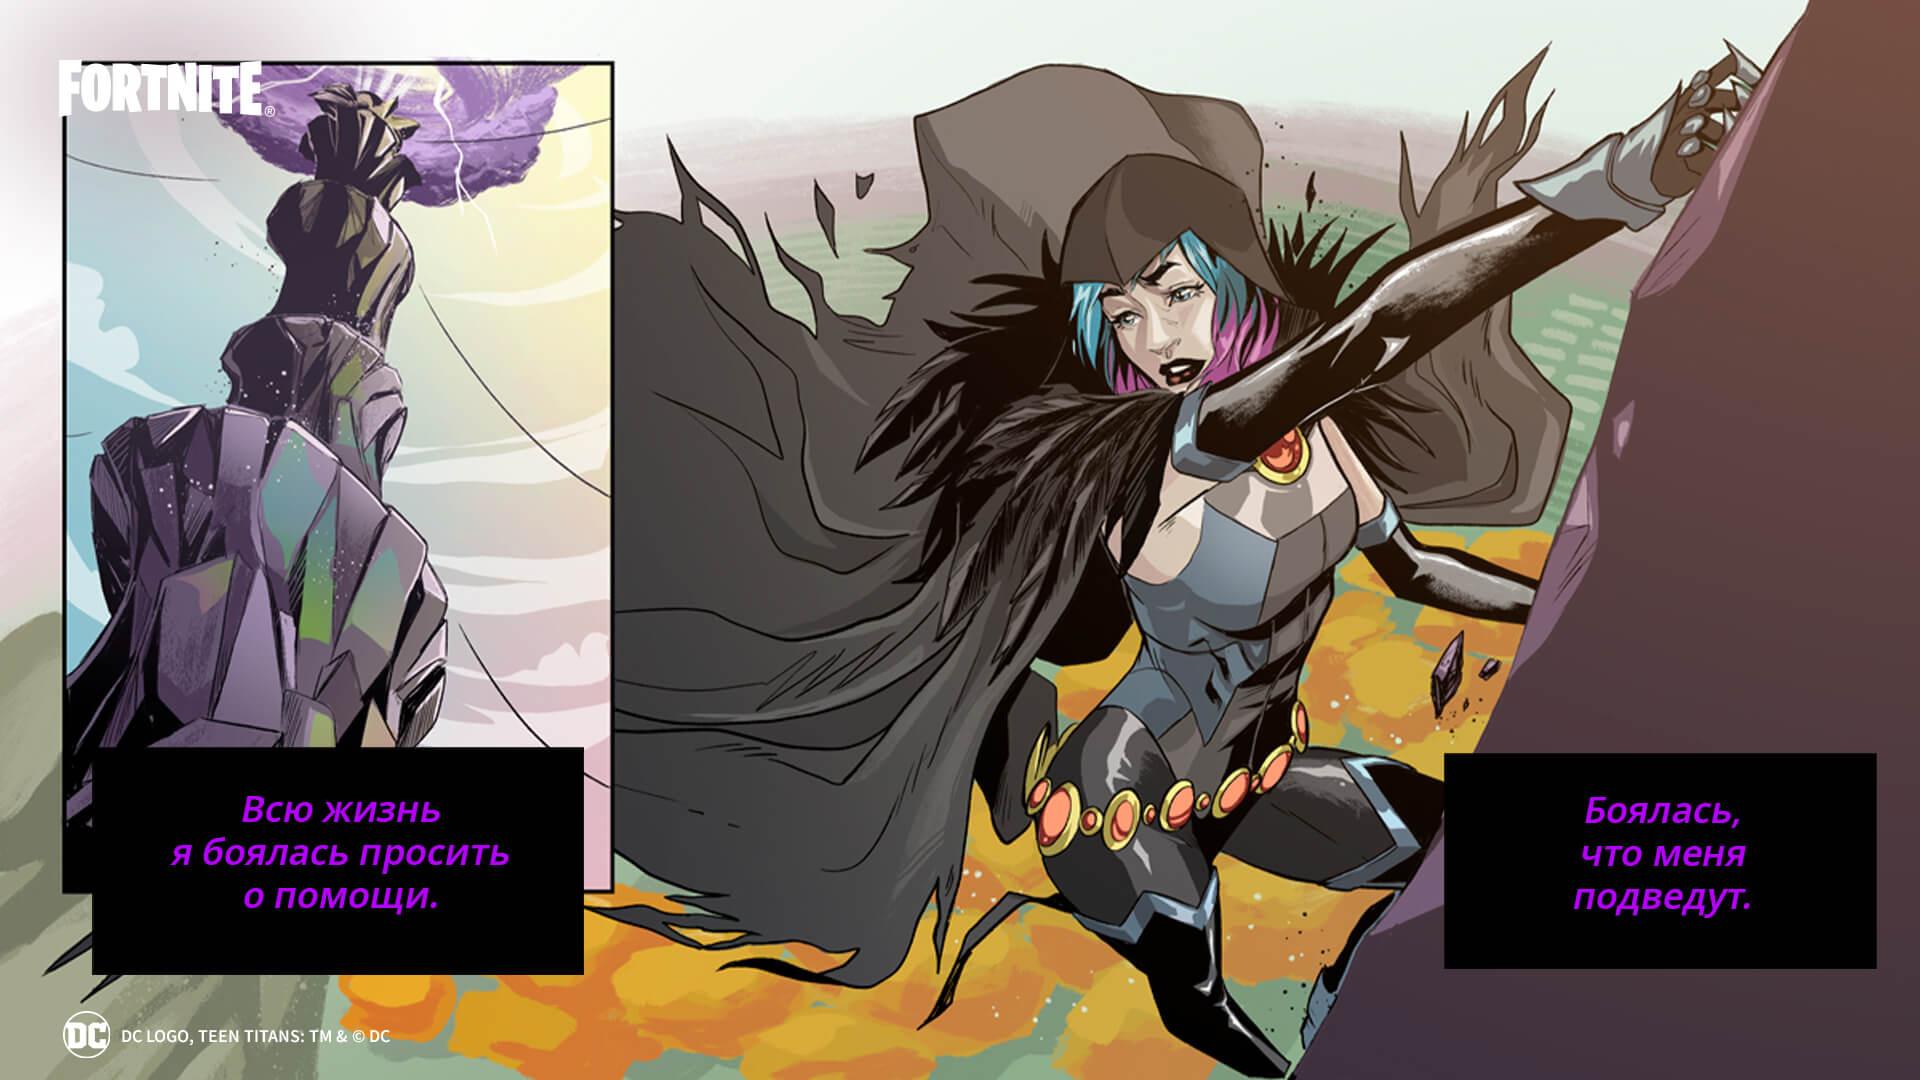 RU Raven BeastBoy S16 01 Social 1920x1080 1